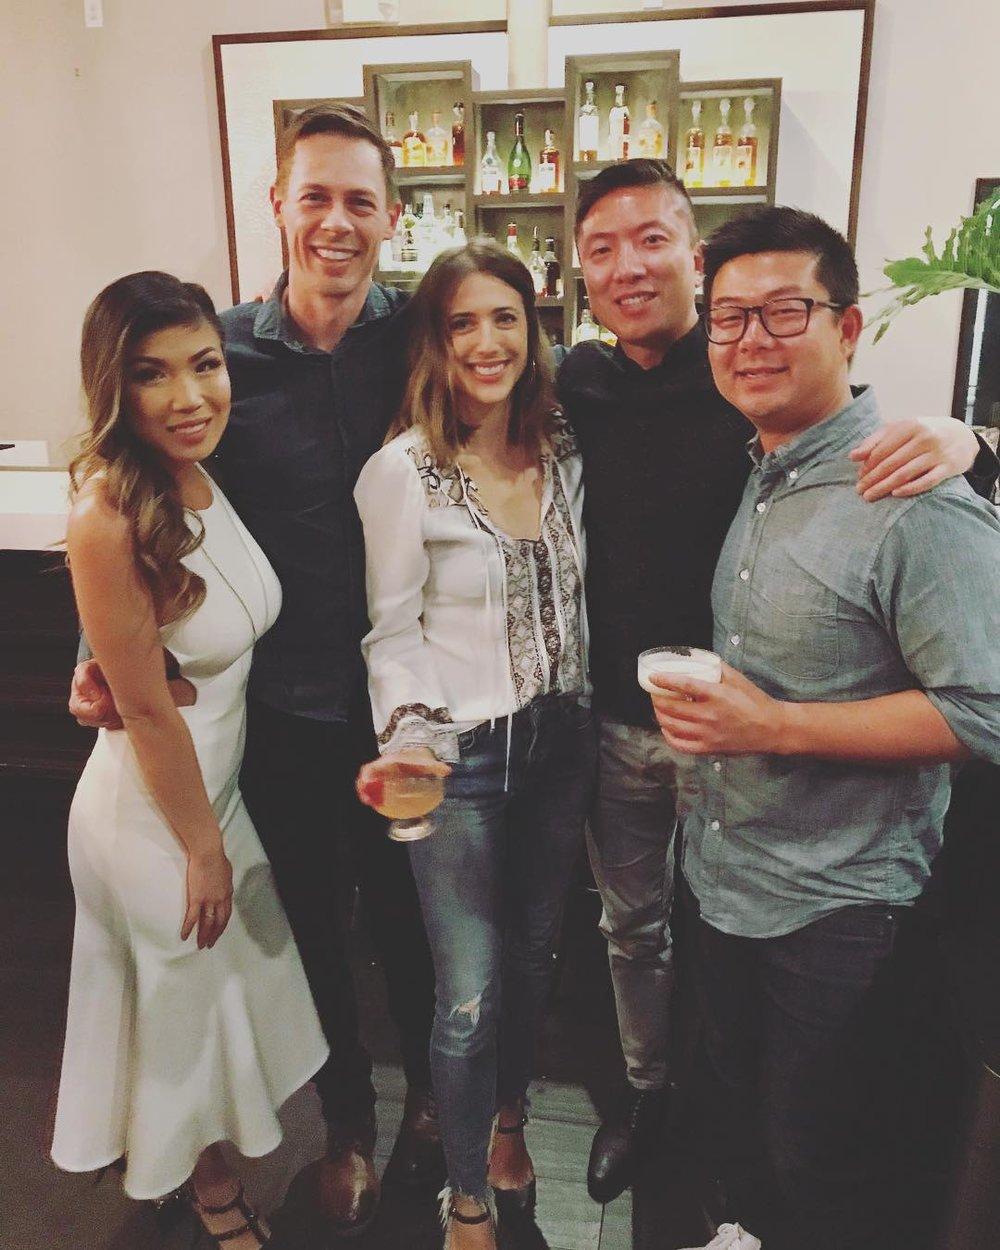 Celebrating Paige 2018